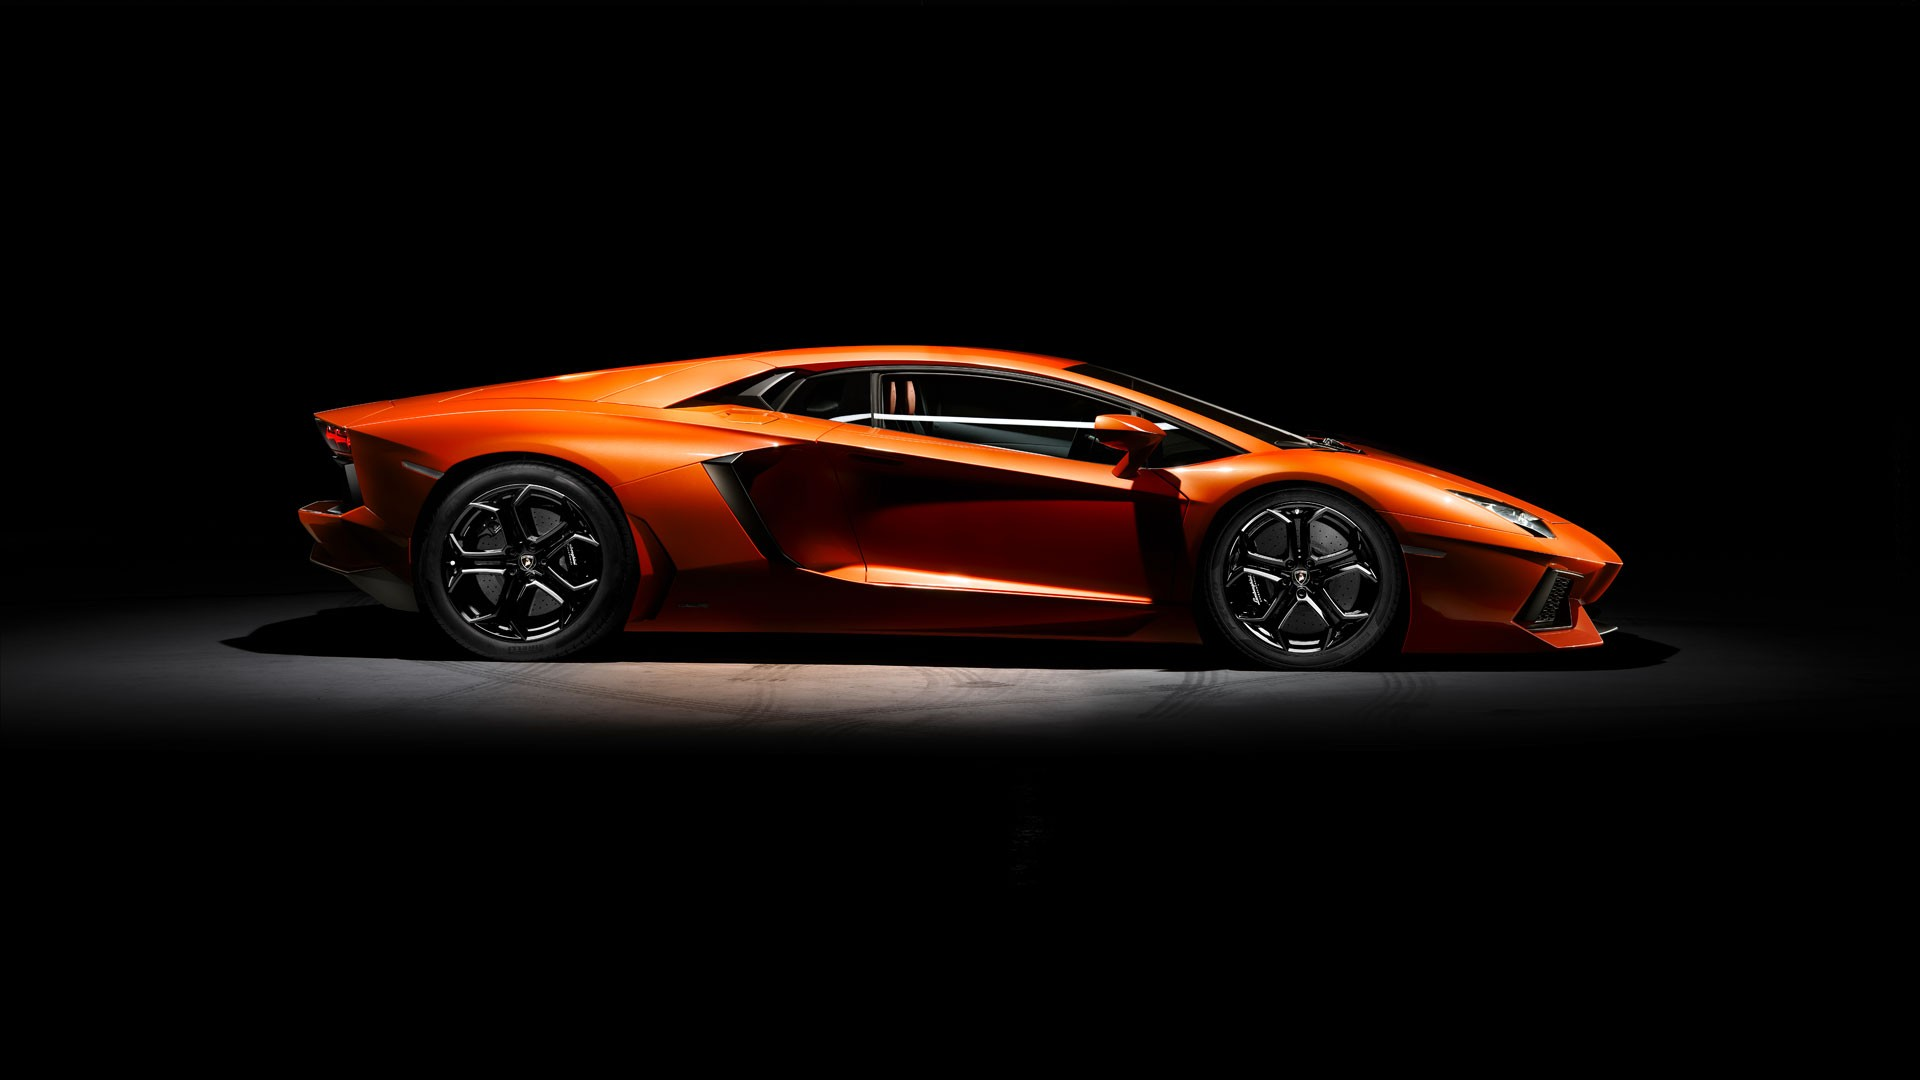 Lamborghini Aventador Side View Wallpaper 66278